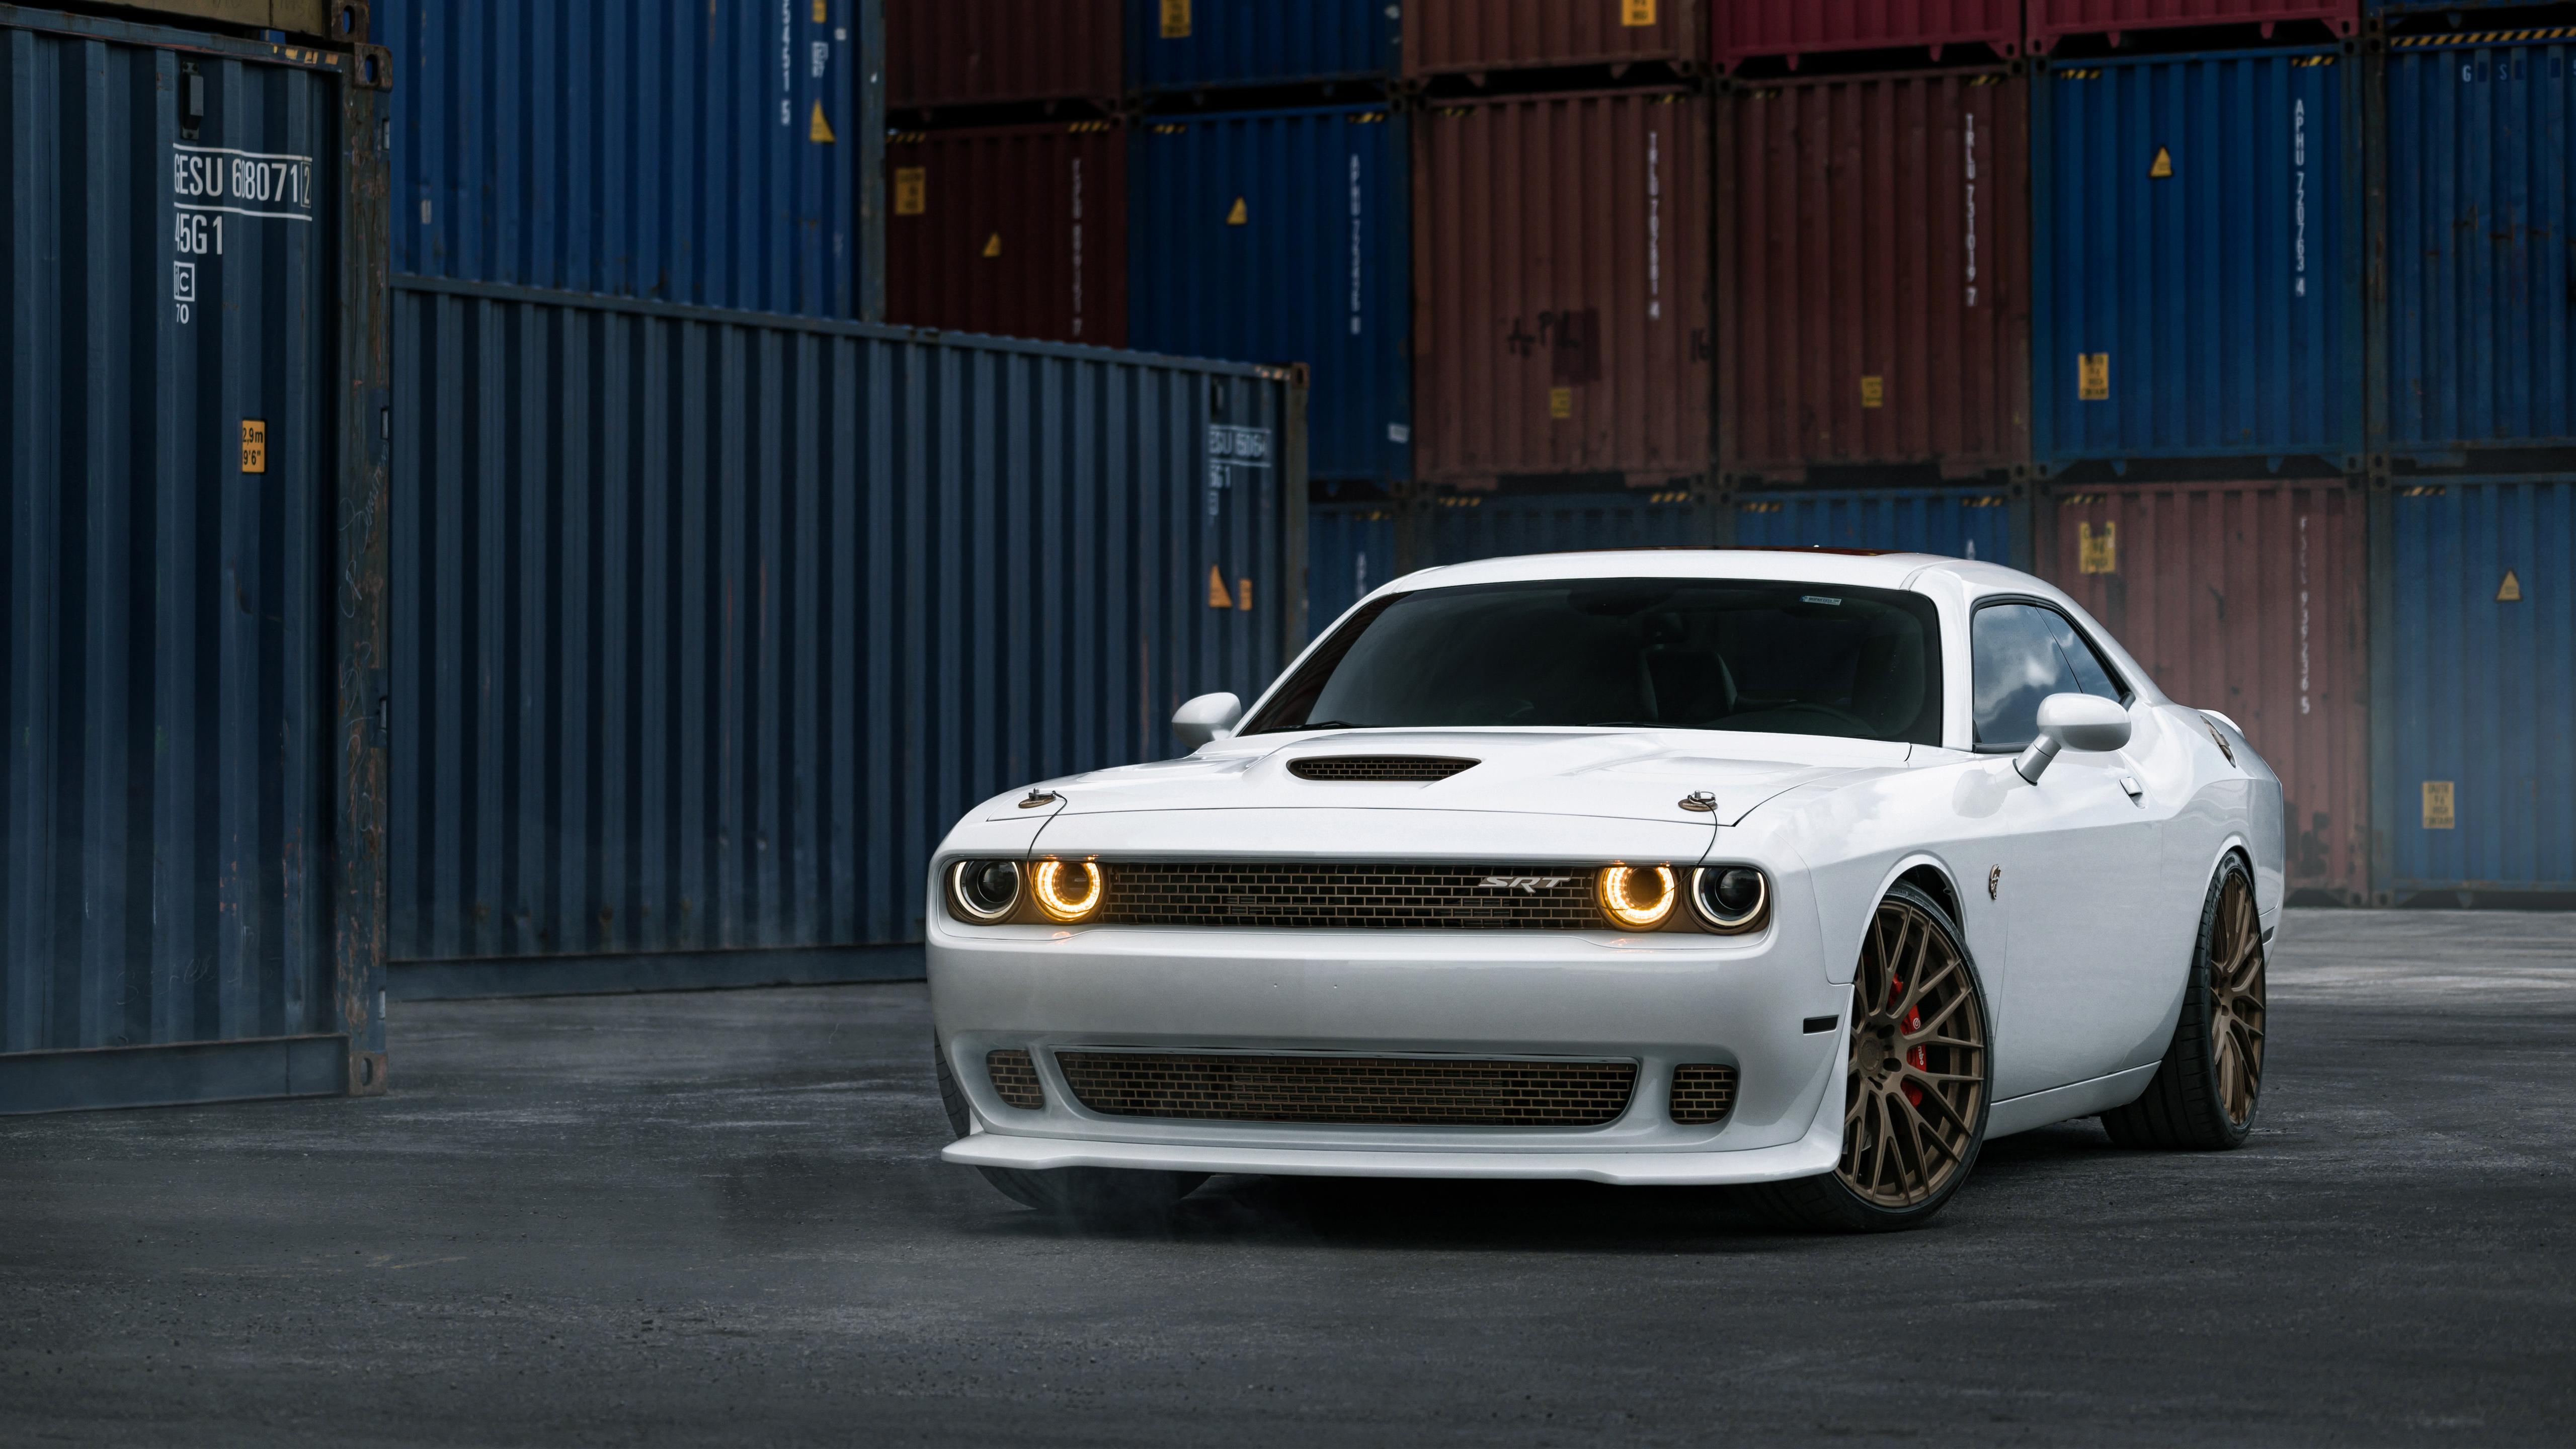 Srt Hellcat >> Dodge Challenger SRT Hellcat White Wallpaper | HD Car Wallpapers| ID #6945